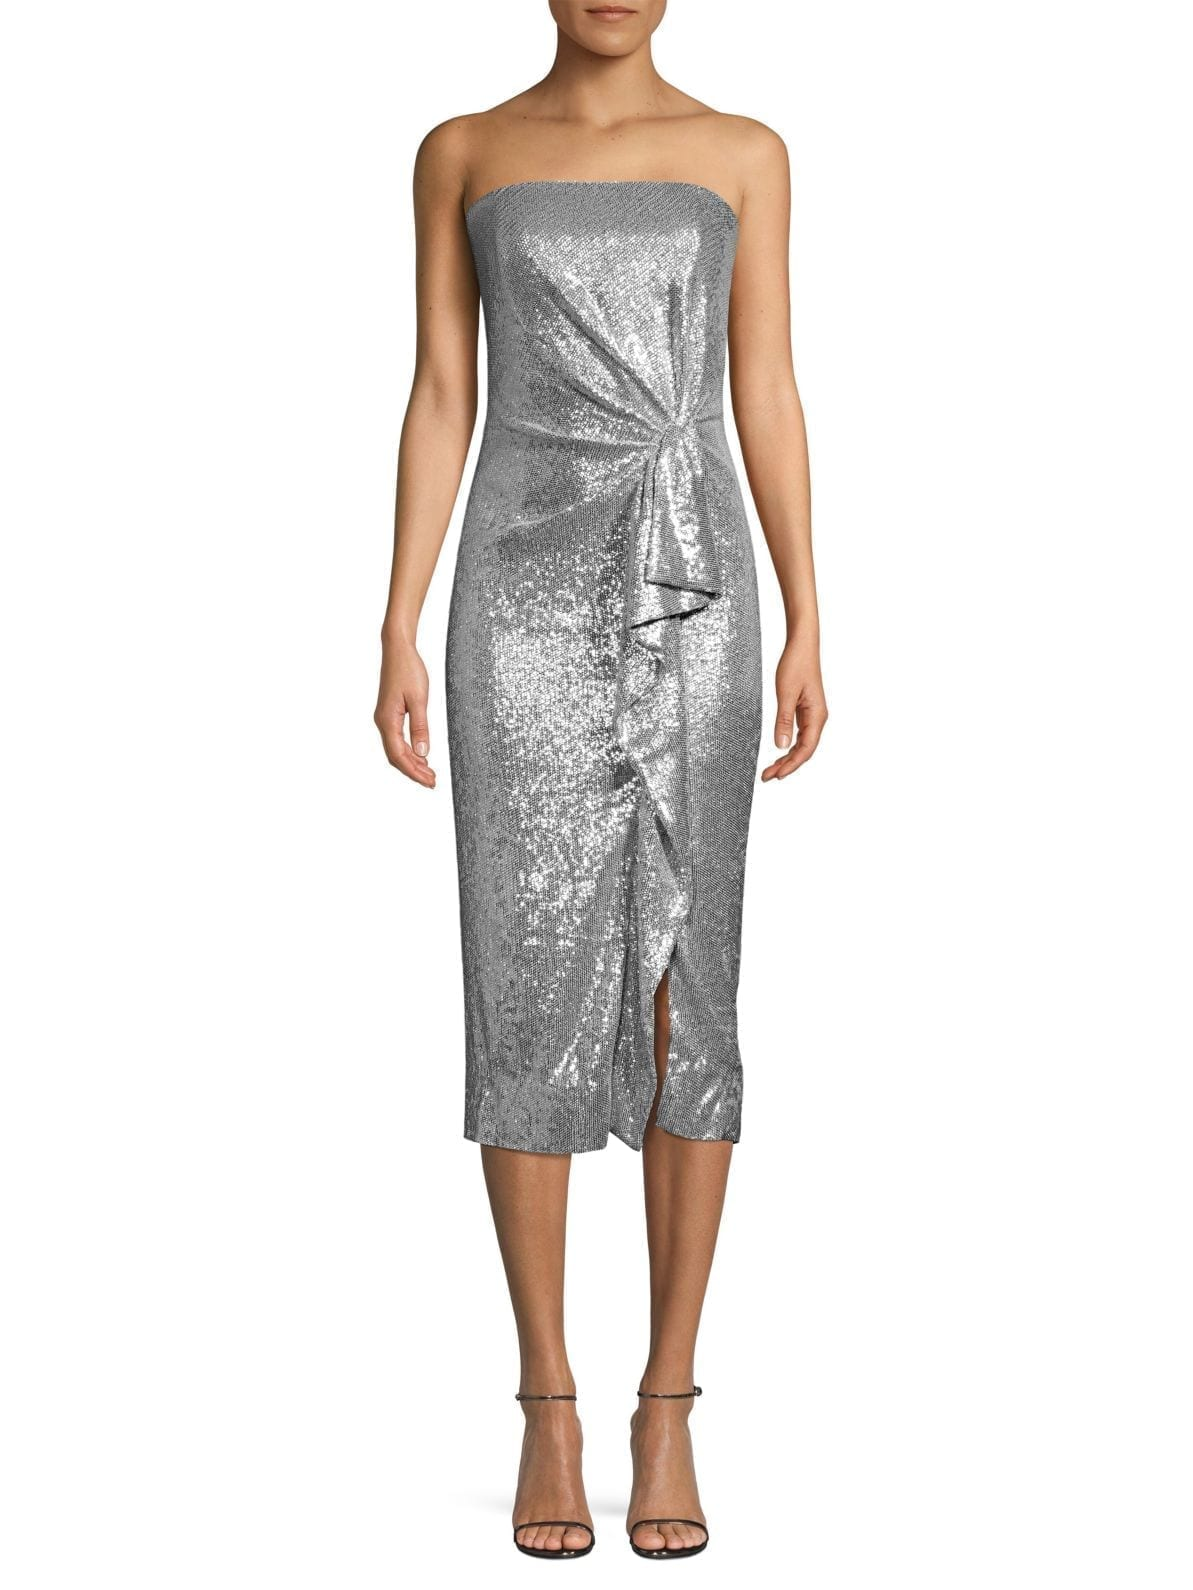 d6a43fc646a RACHEL ZOE Krista Sequinned Strapless Silver Dress - We Select Dresses